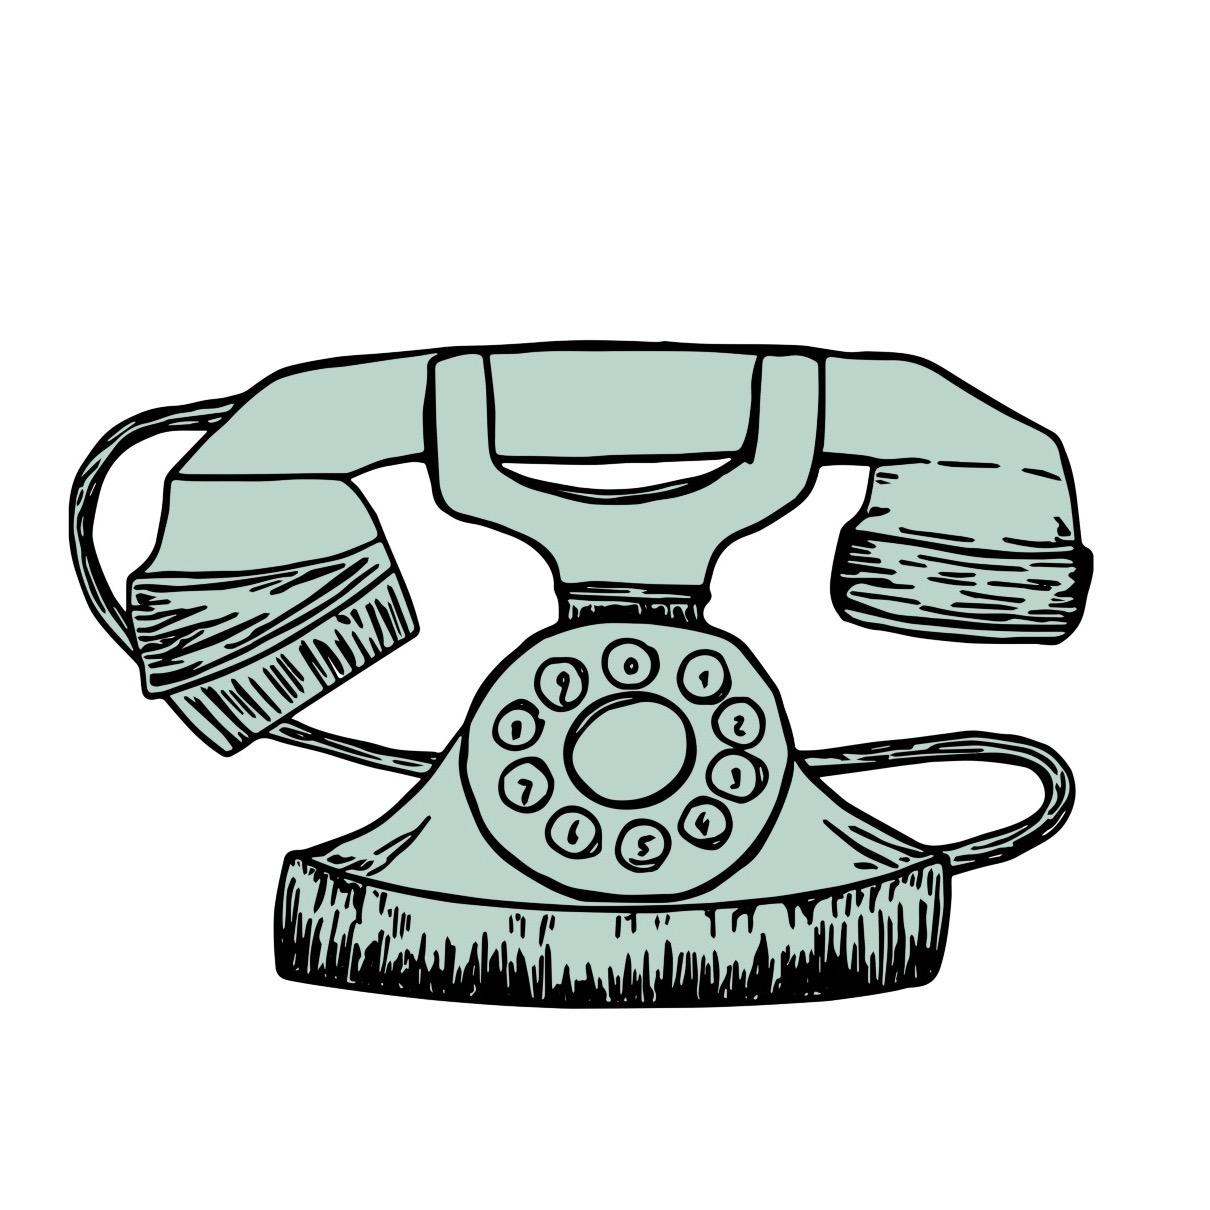 contact telefoon mail gesprek